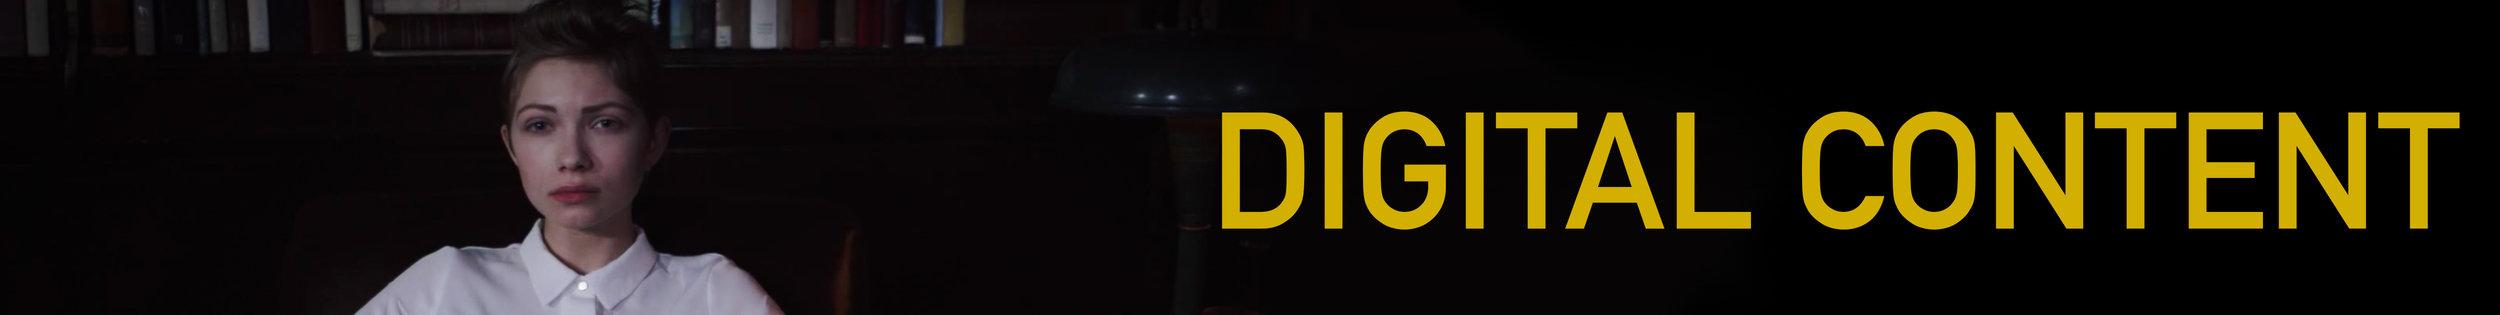 Website_Digital Content_02.jpg